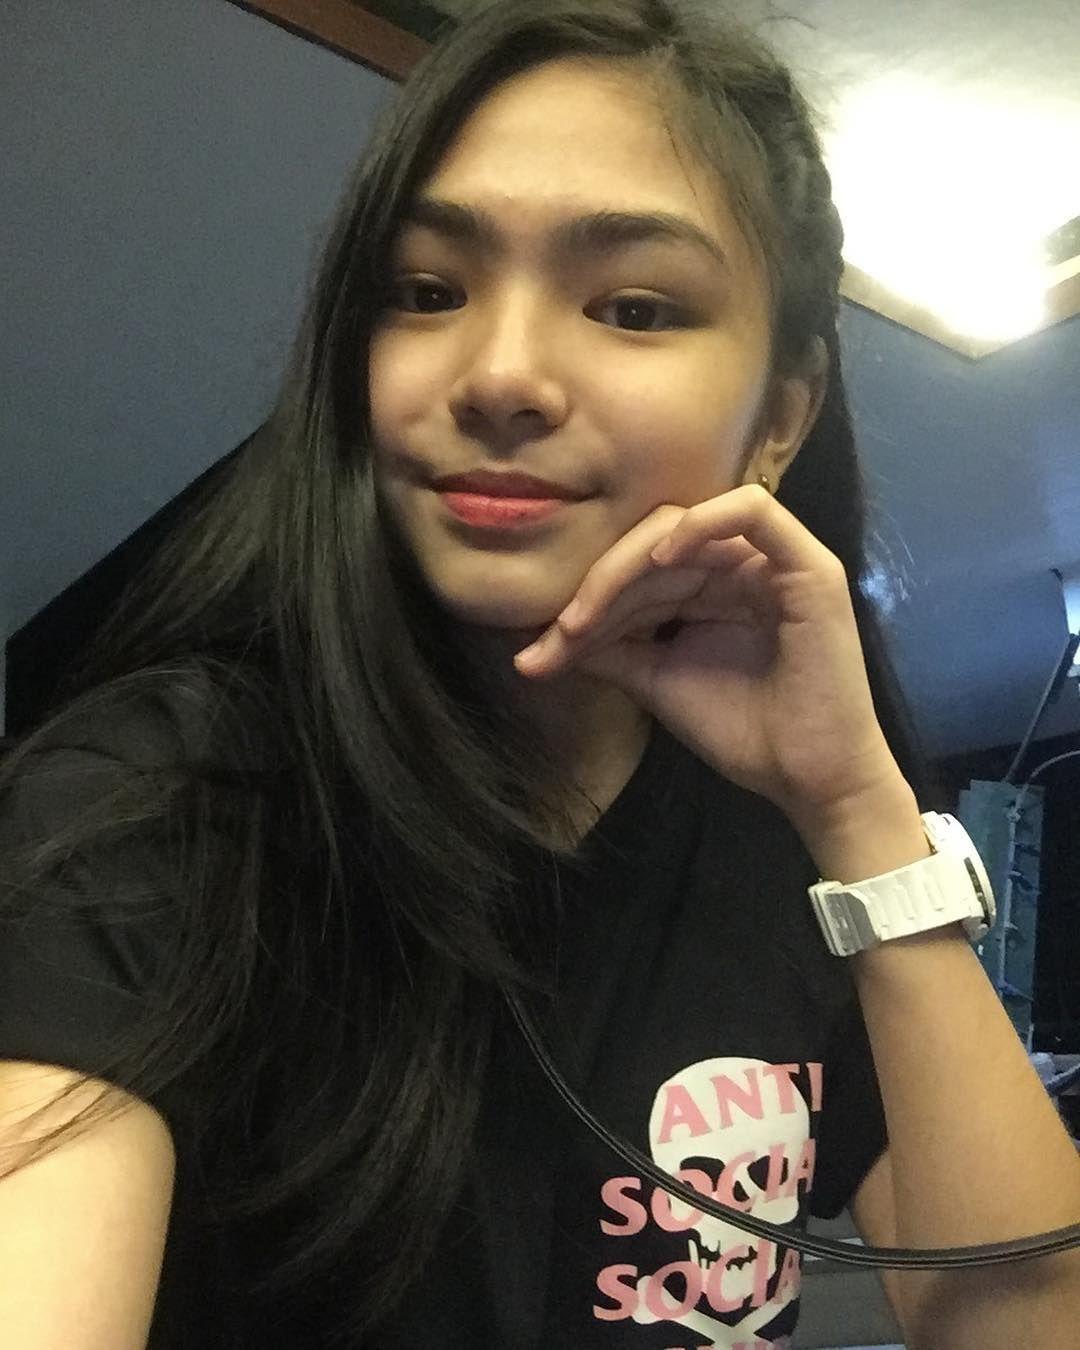 page288 2017 always happy in 2019 Cute girls Cute 1080x1350